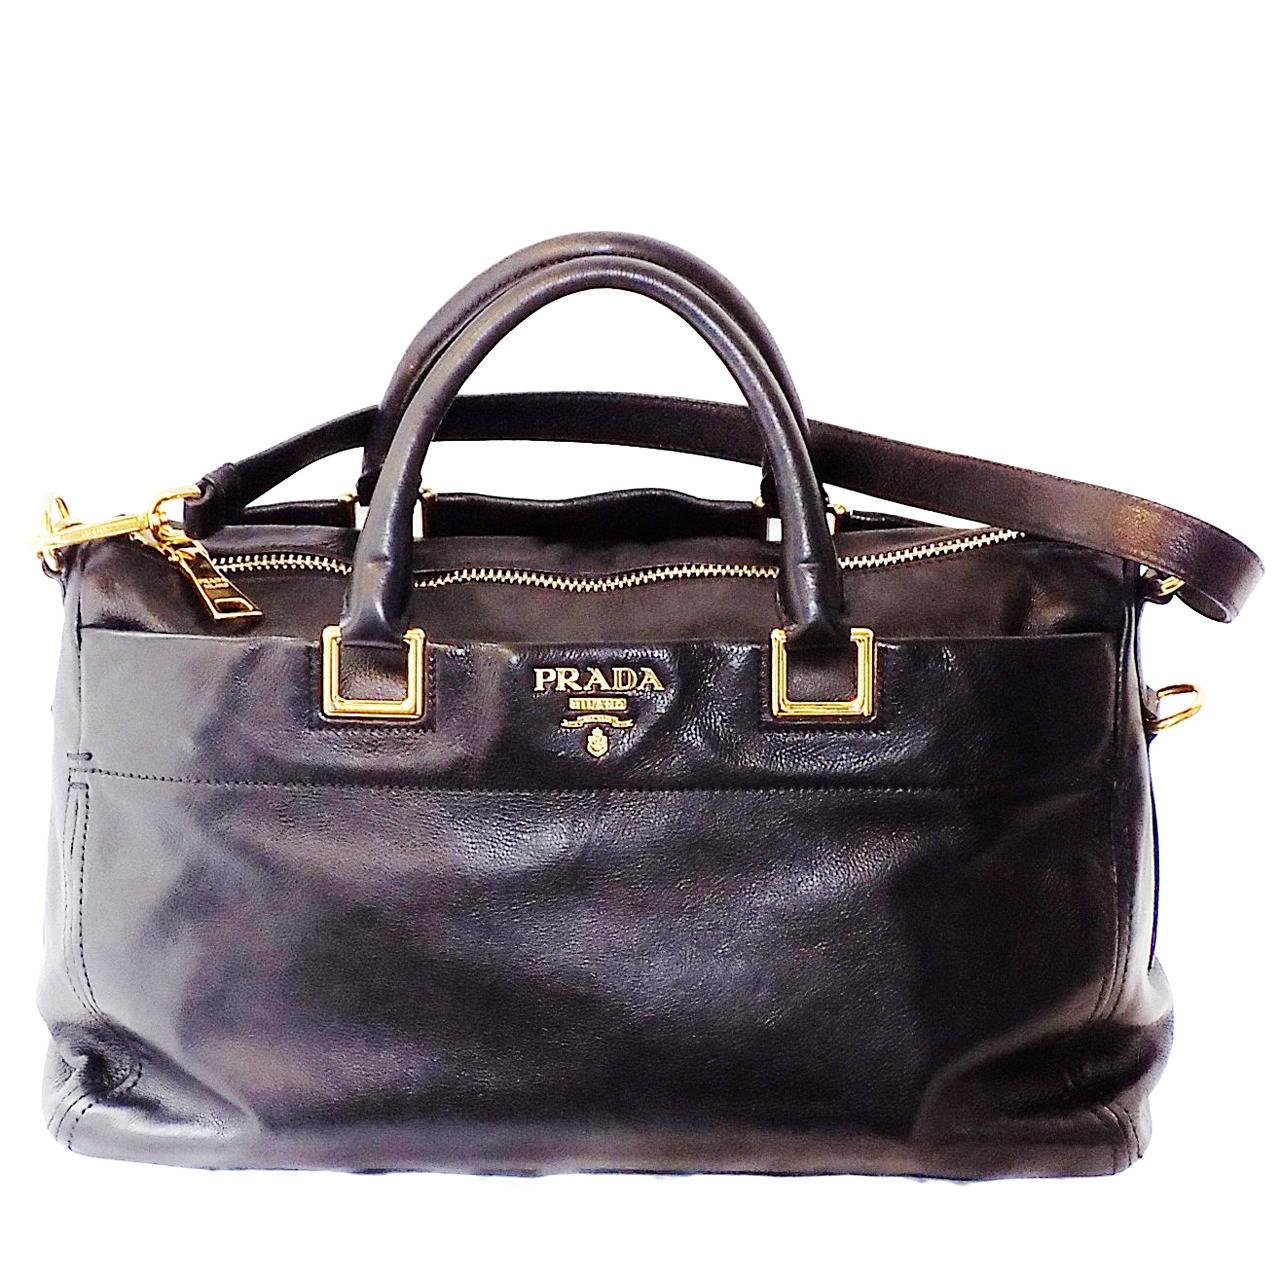 PRADA Executive Black soft leather Tote Bag at 1stdibs